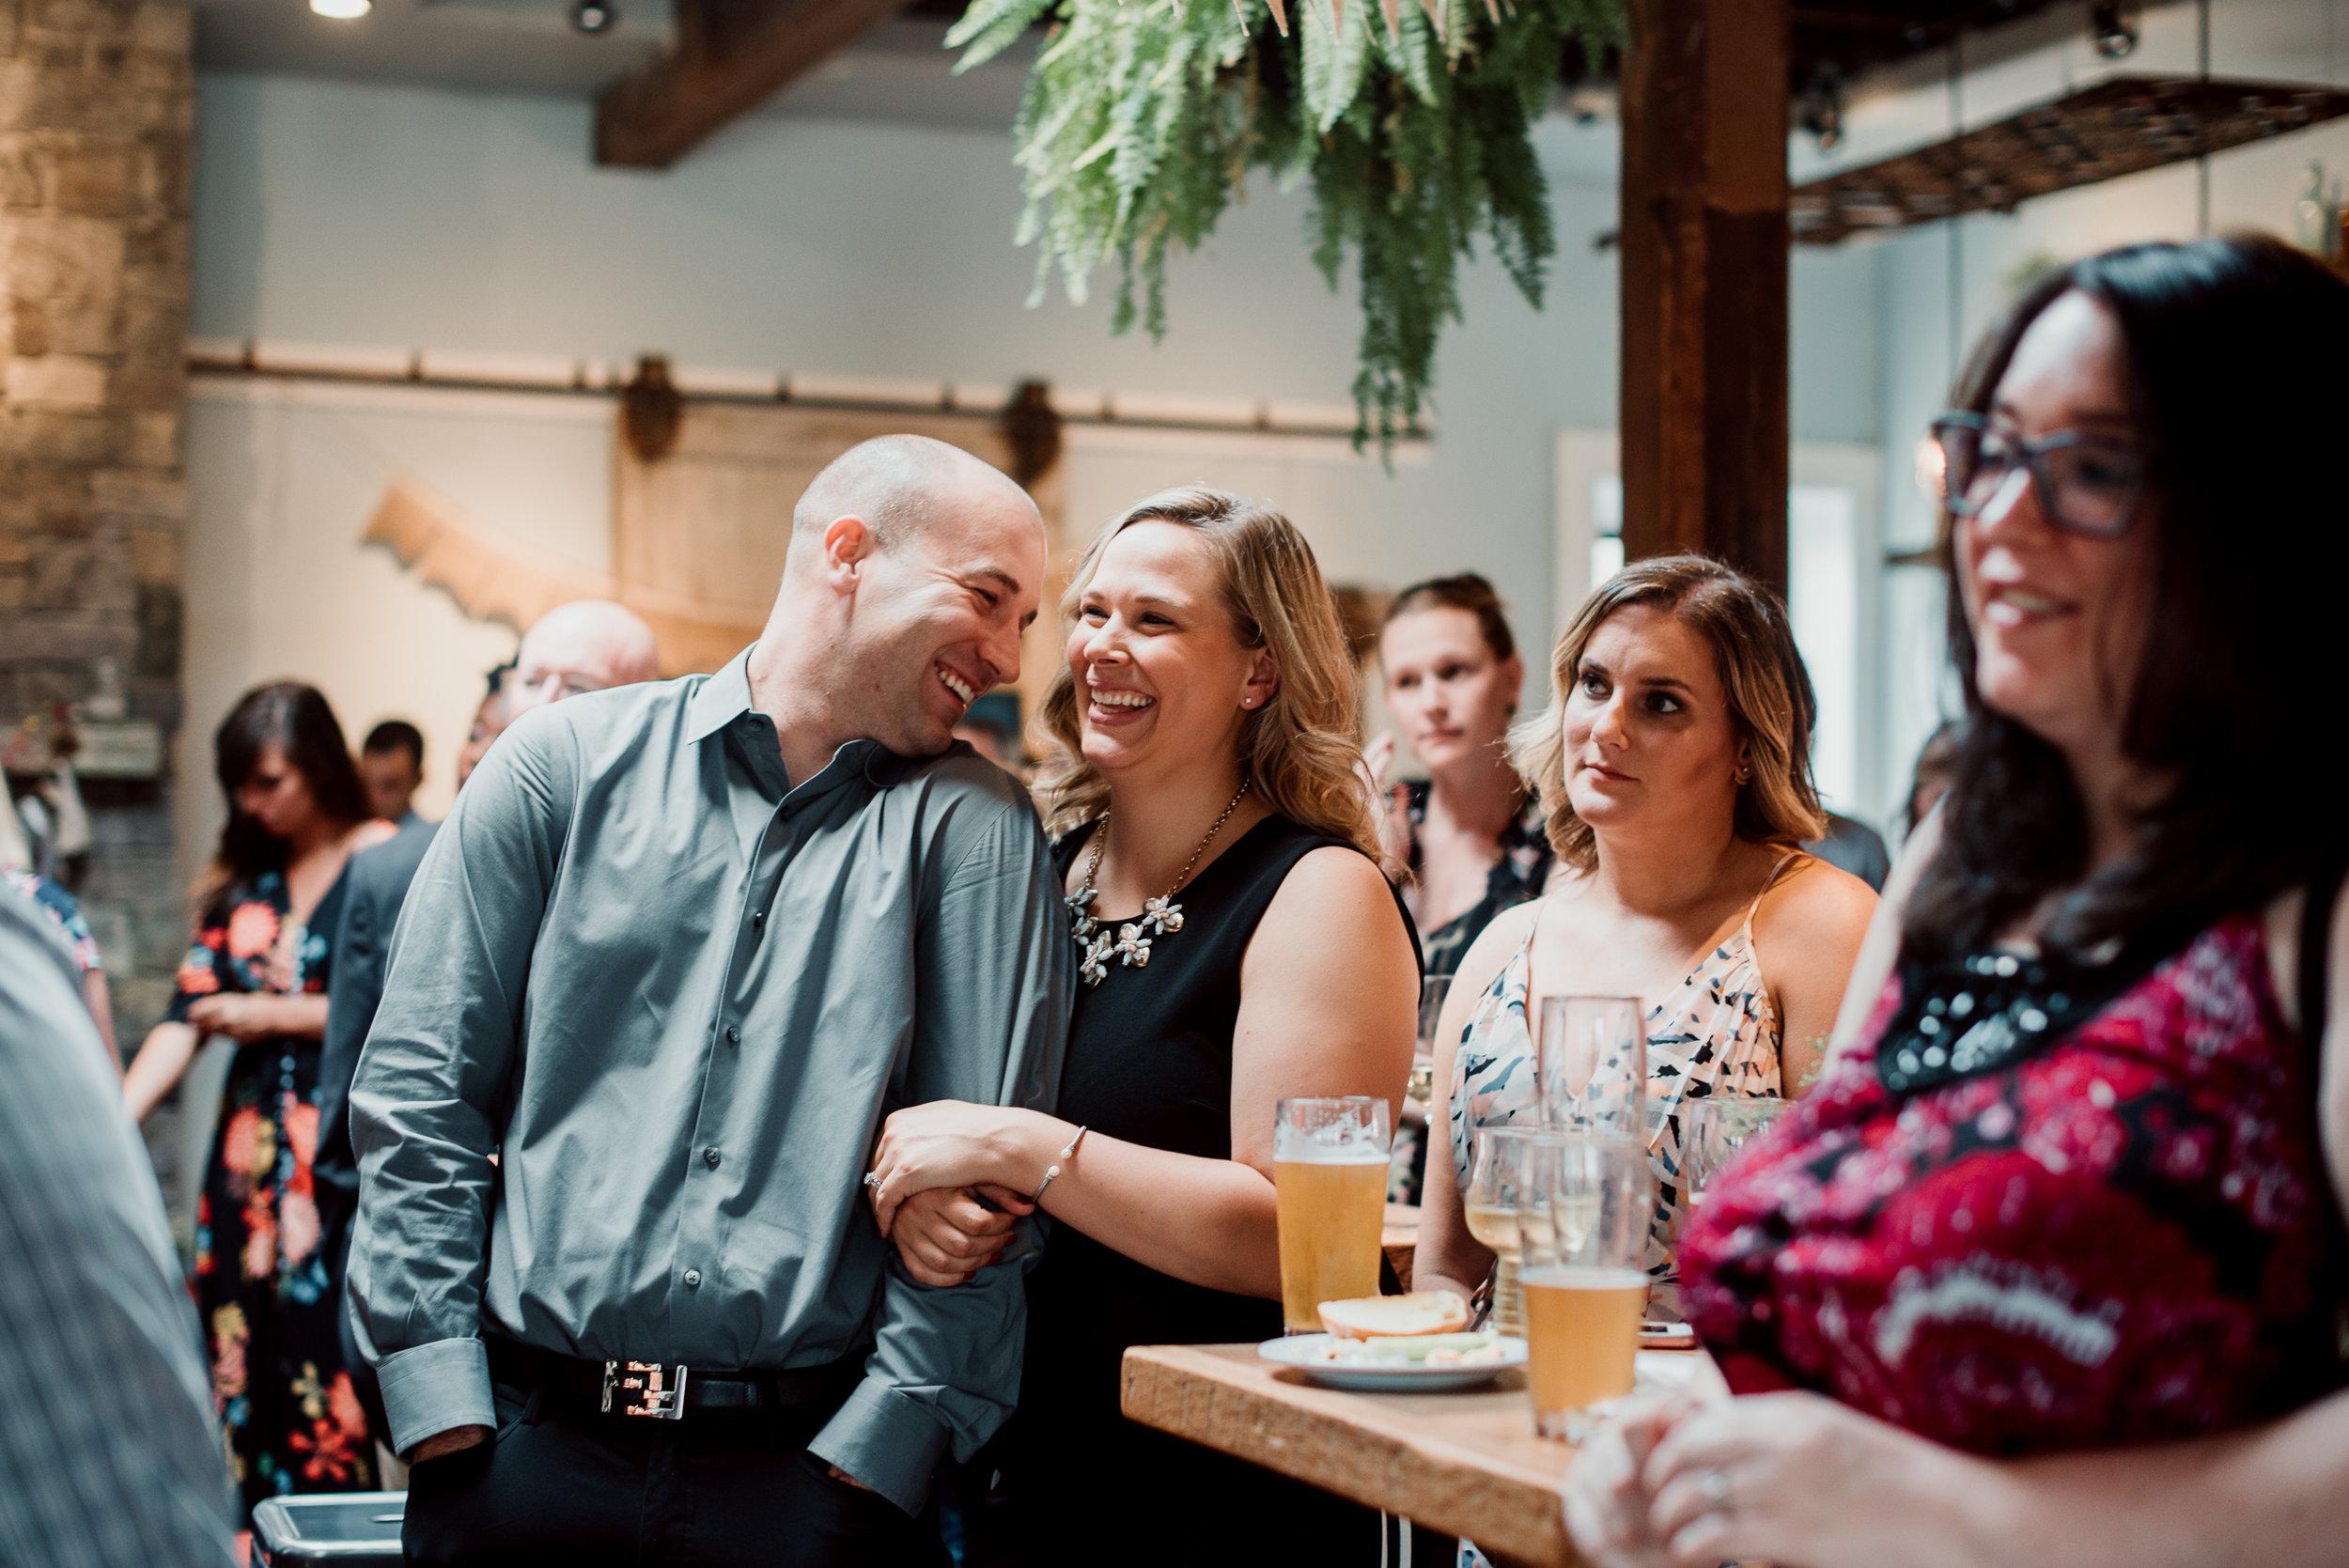 Philadelphia-wedding-photographer-la-cabra-brewery-diy-Peaberry-Photography-038.jpg